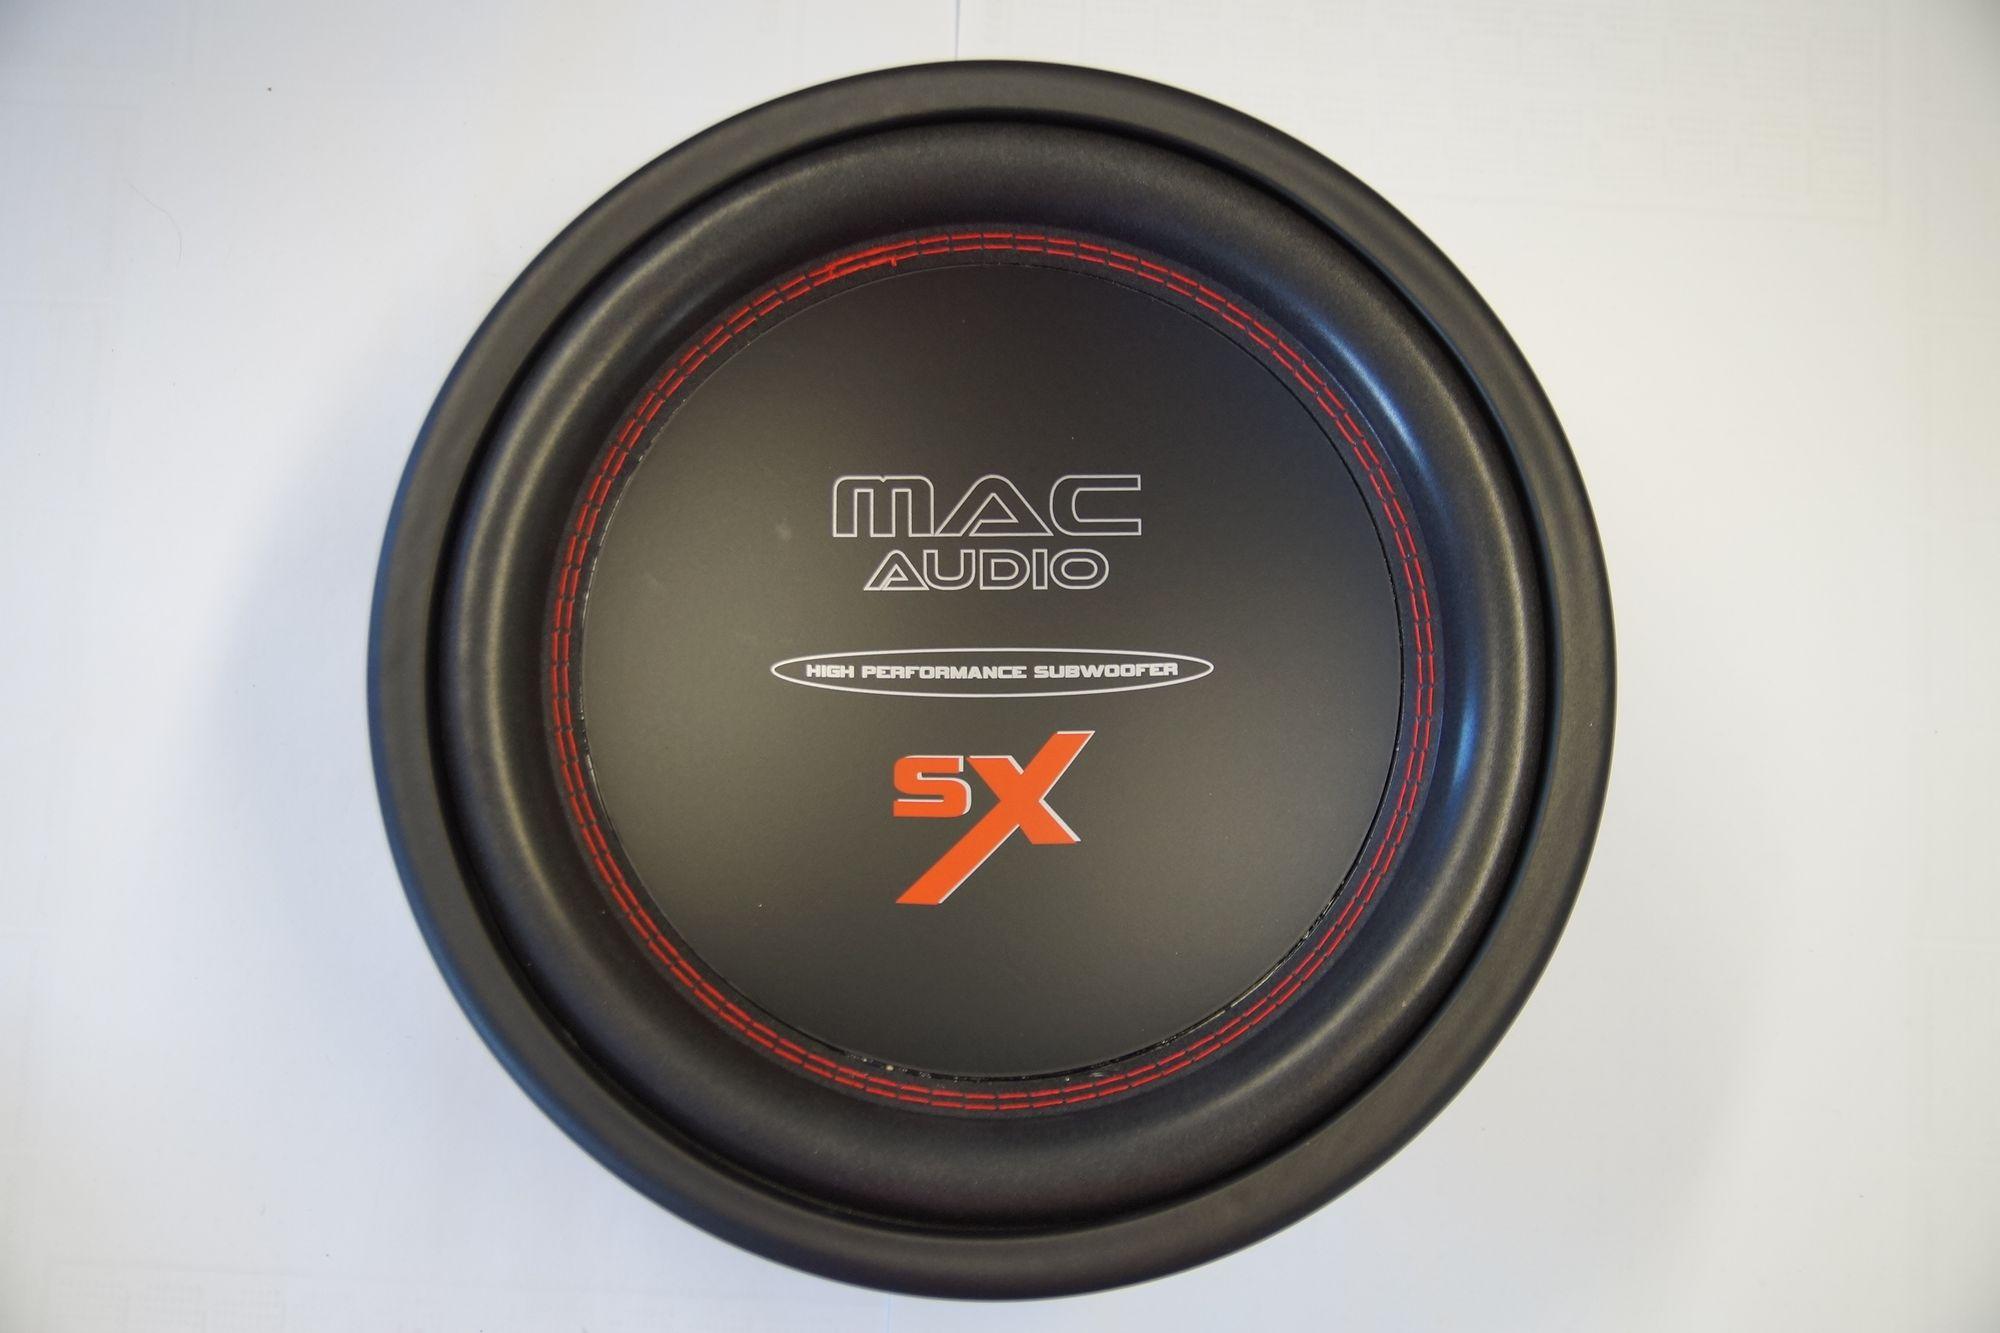 Mac Audio SX 12 Subwoofer Basslautsprecher Tieftöner 30 cm 1000 Watt